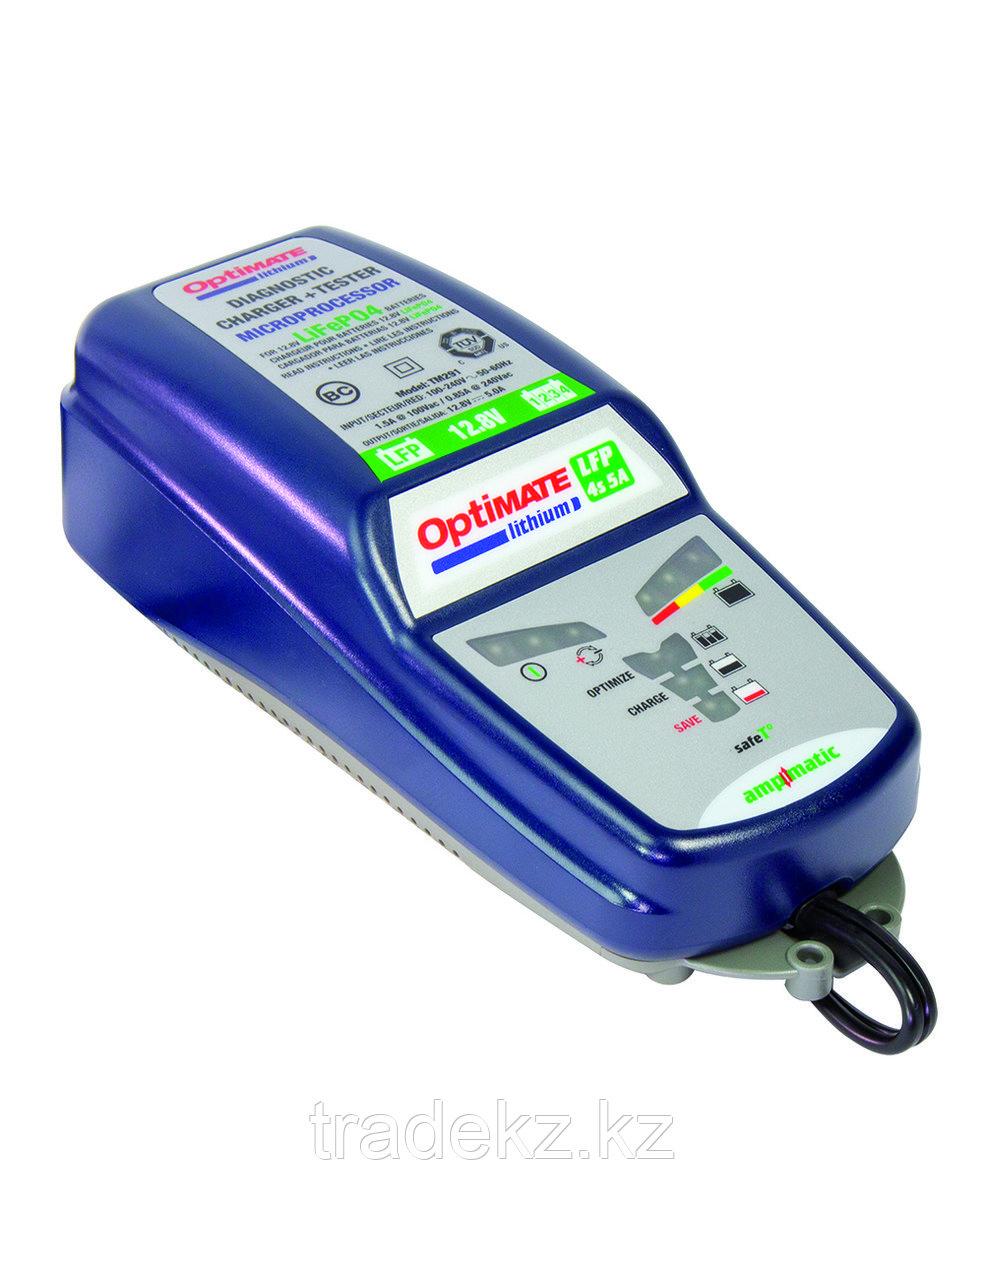 Зарядное устройство TM290 OptiMate Lithuim (1x5, 12V)